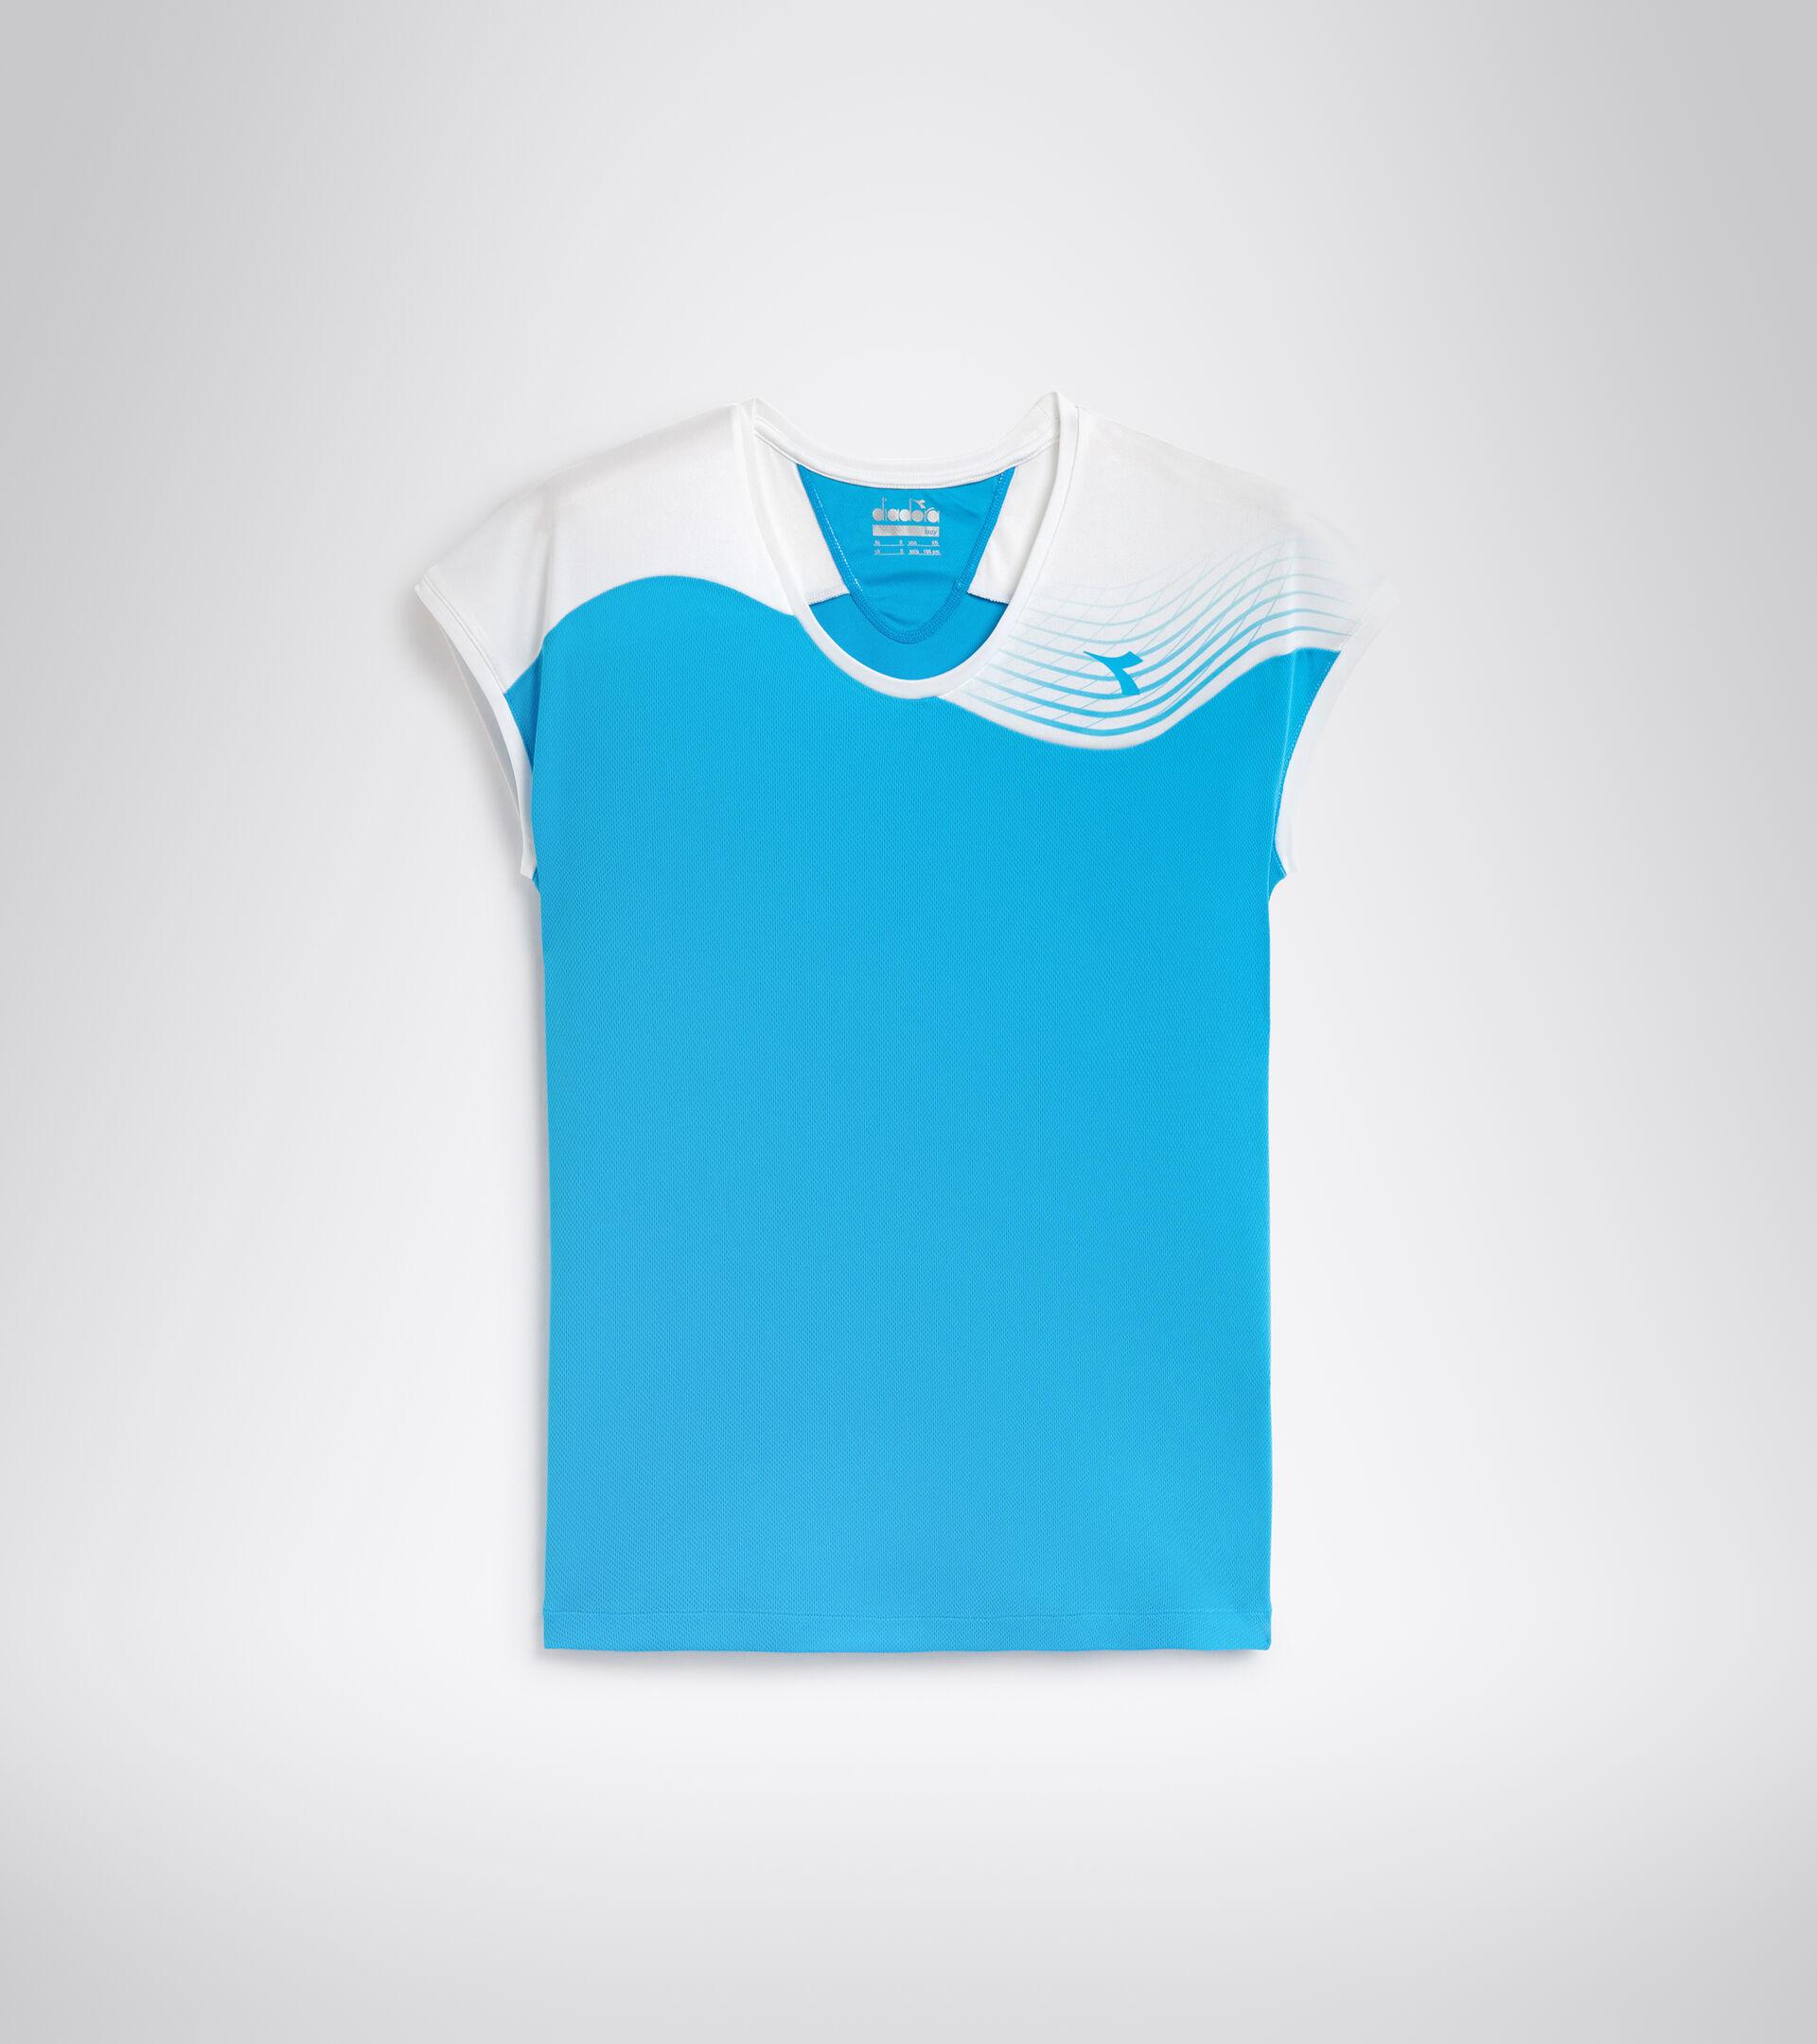 Apparel Sport DONNA L. T-SHIRT COURT ROYAL FLUO Diadora